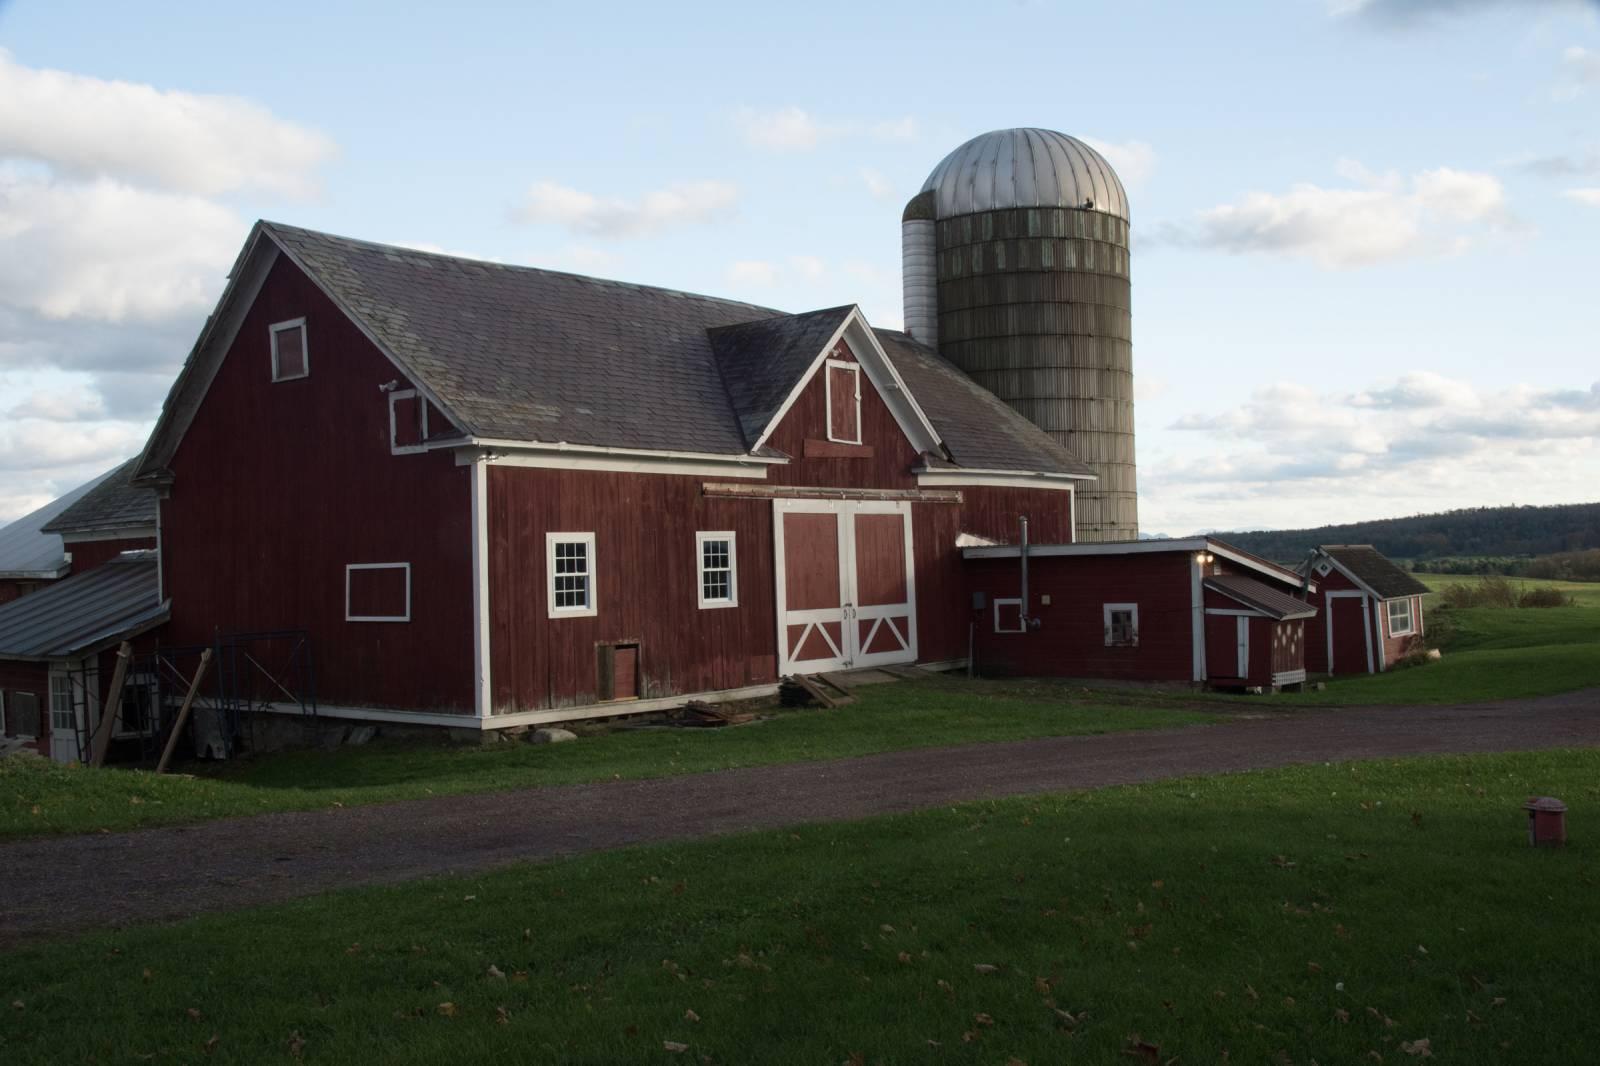 Vermont Wedding Barns We Love | Vermont Venue Spotlight | Gallery